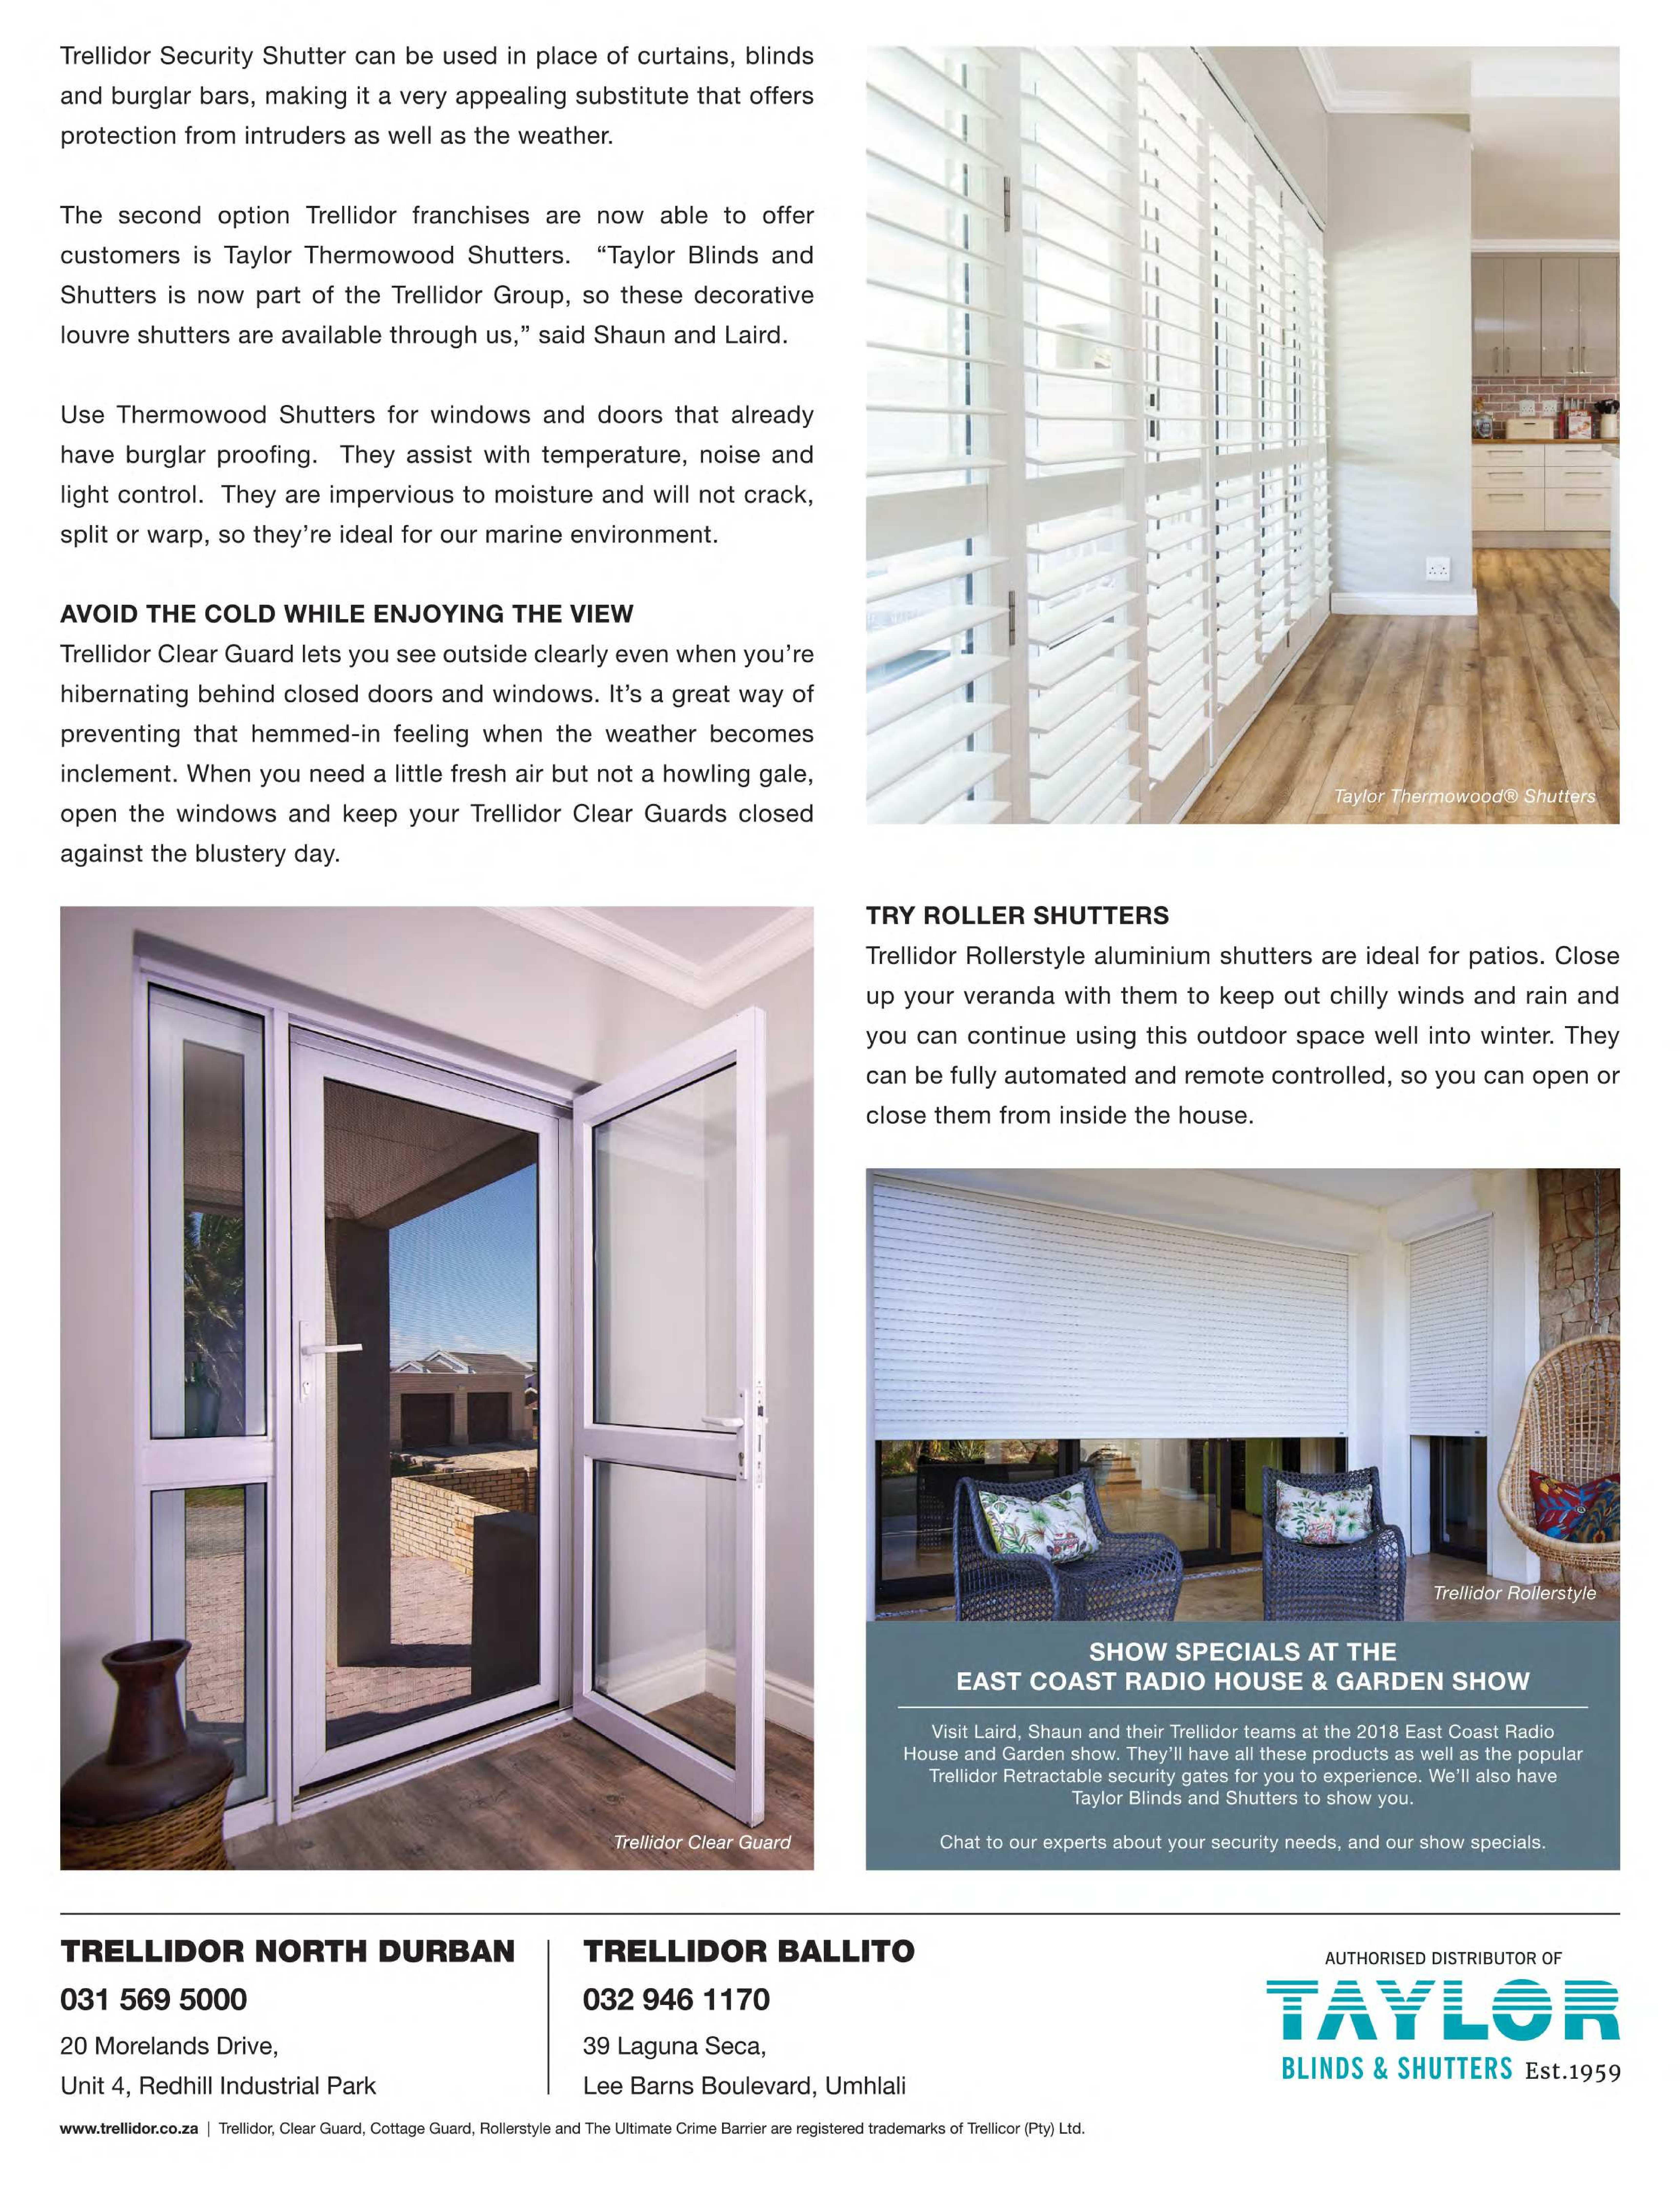 get-magazine-ballitoumhlanga-july-2018-epapers-page-3